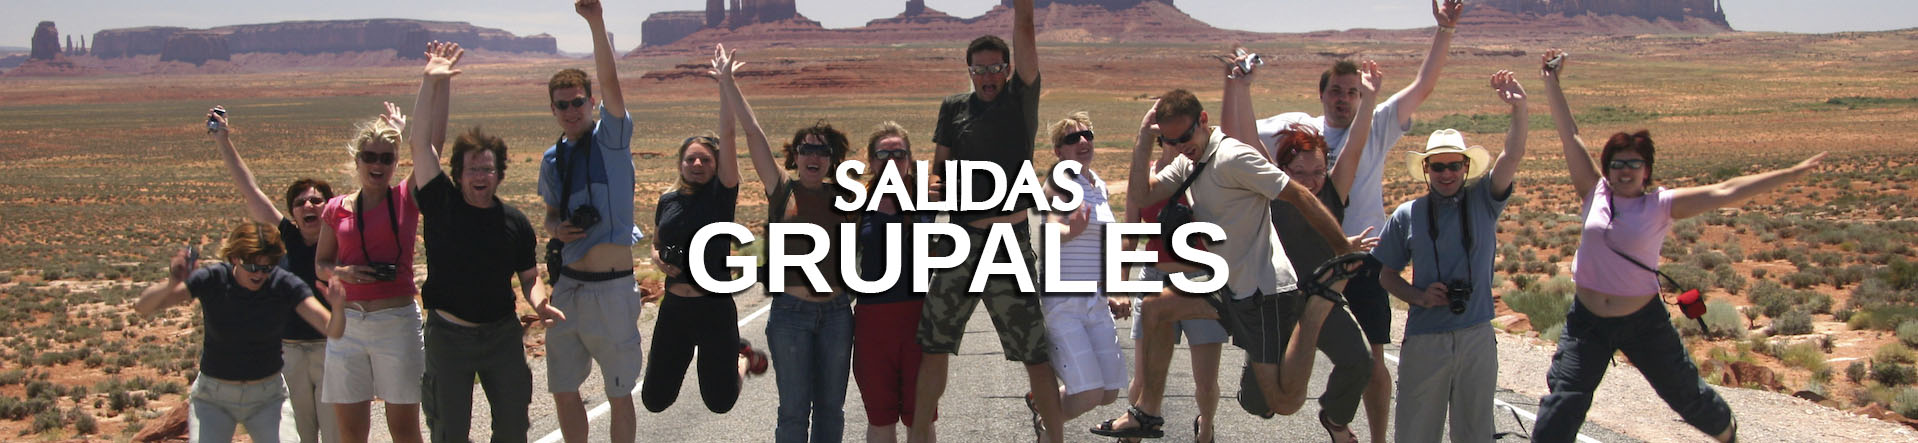 Grupales desde Argentina